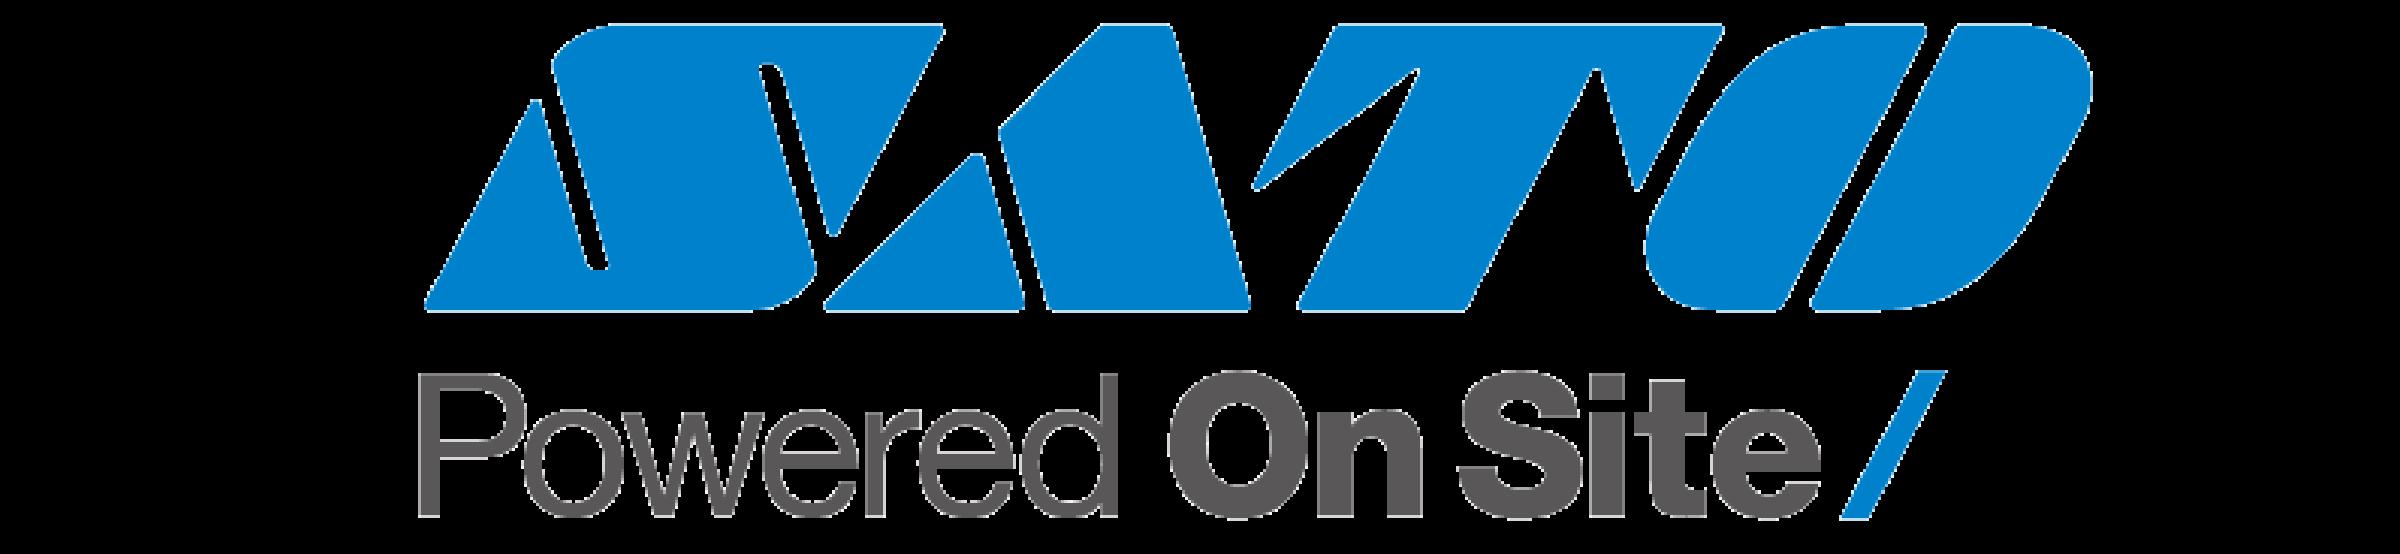 SATO Printing Solutions logo